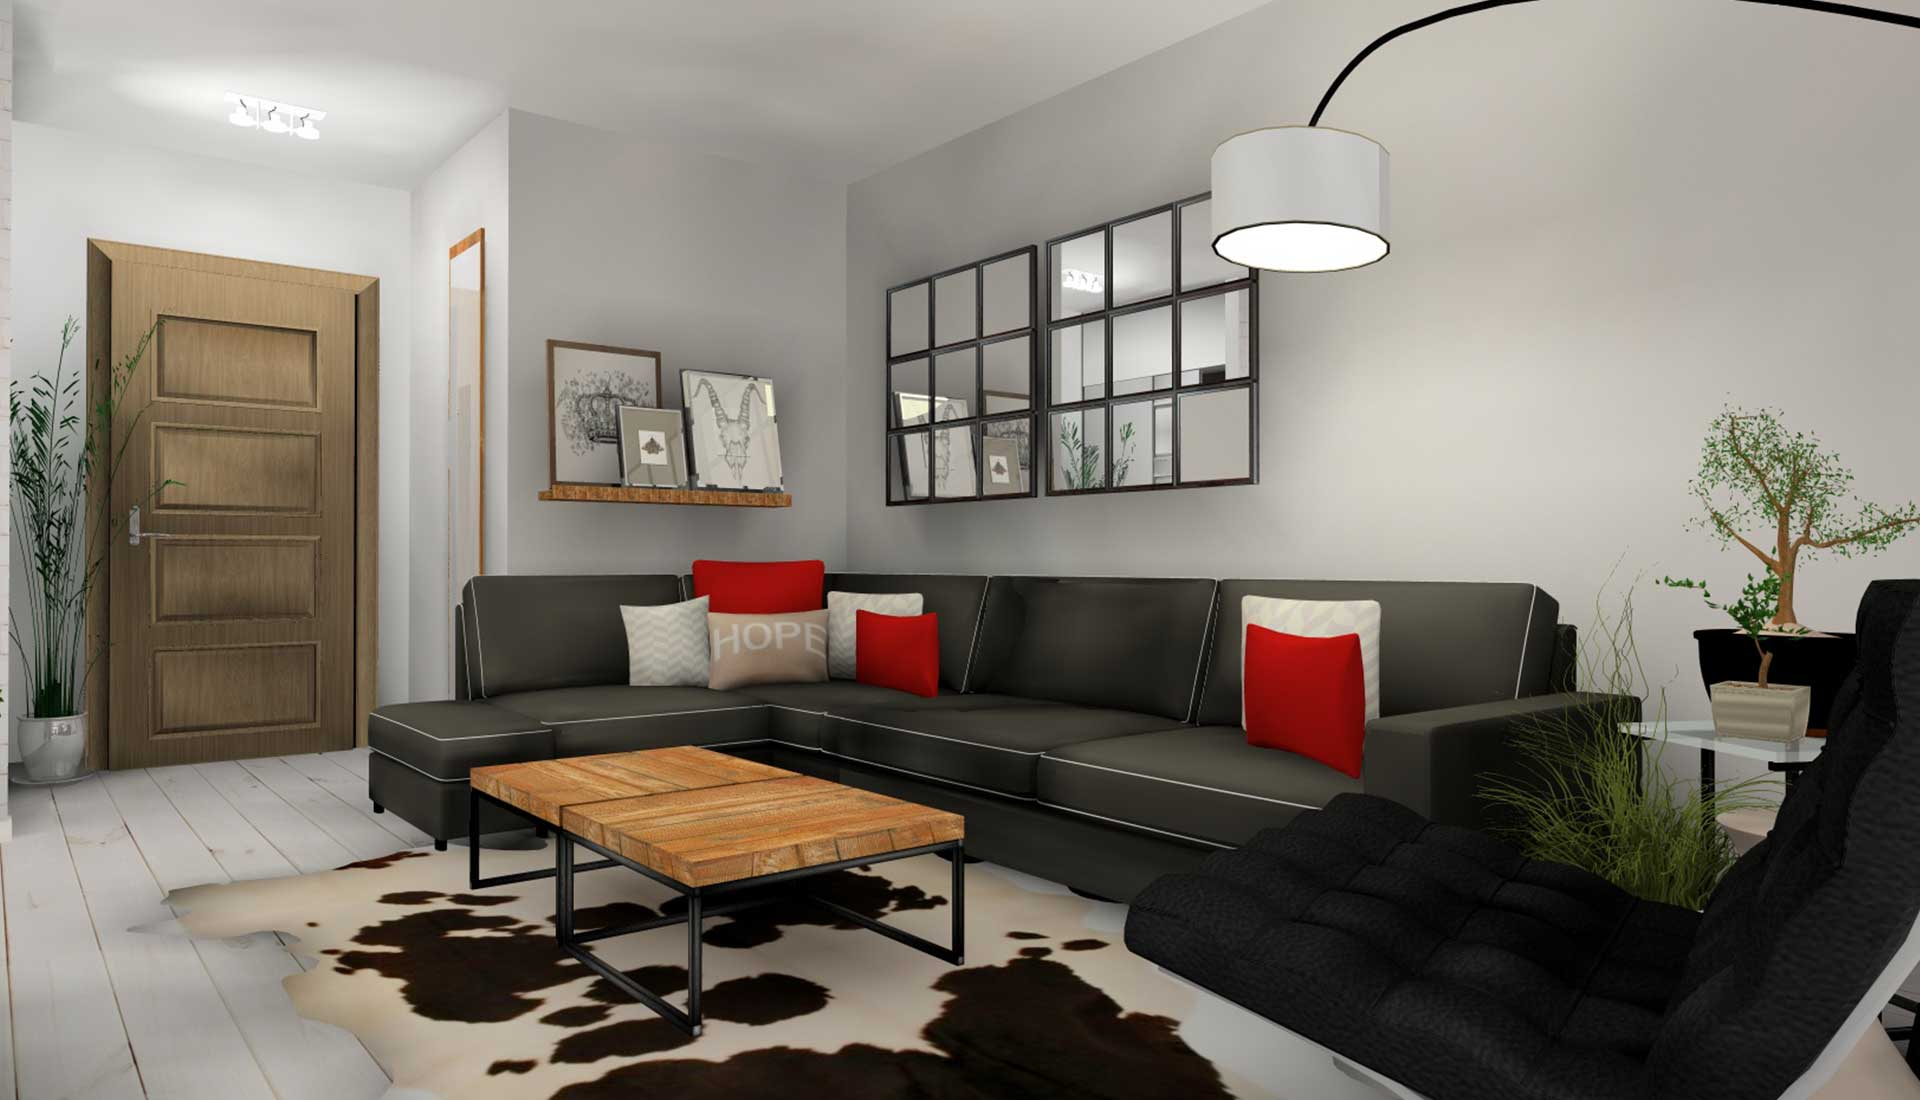 pdecoracion de interiores pozuelo sofa